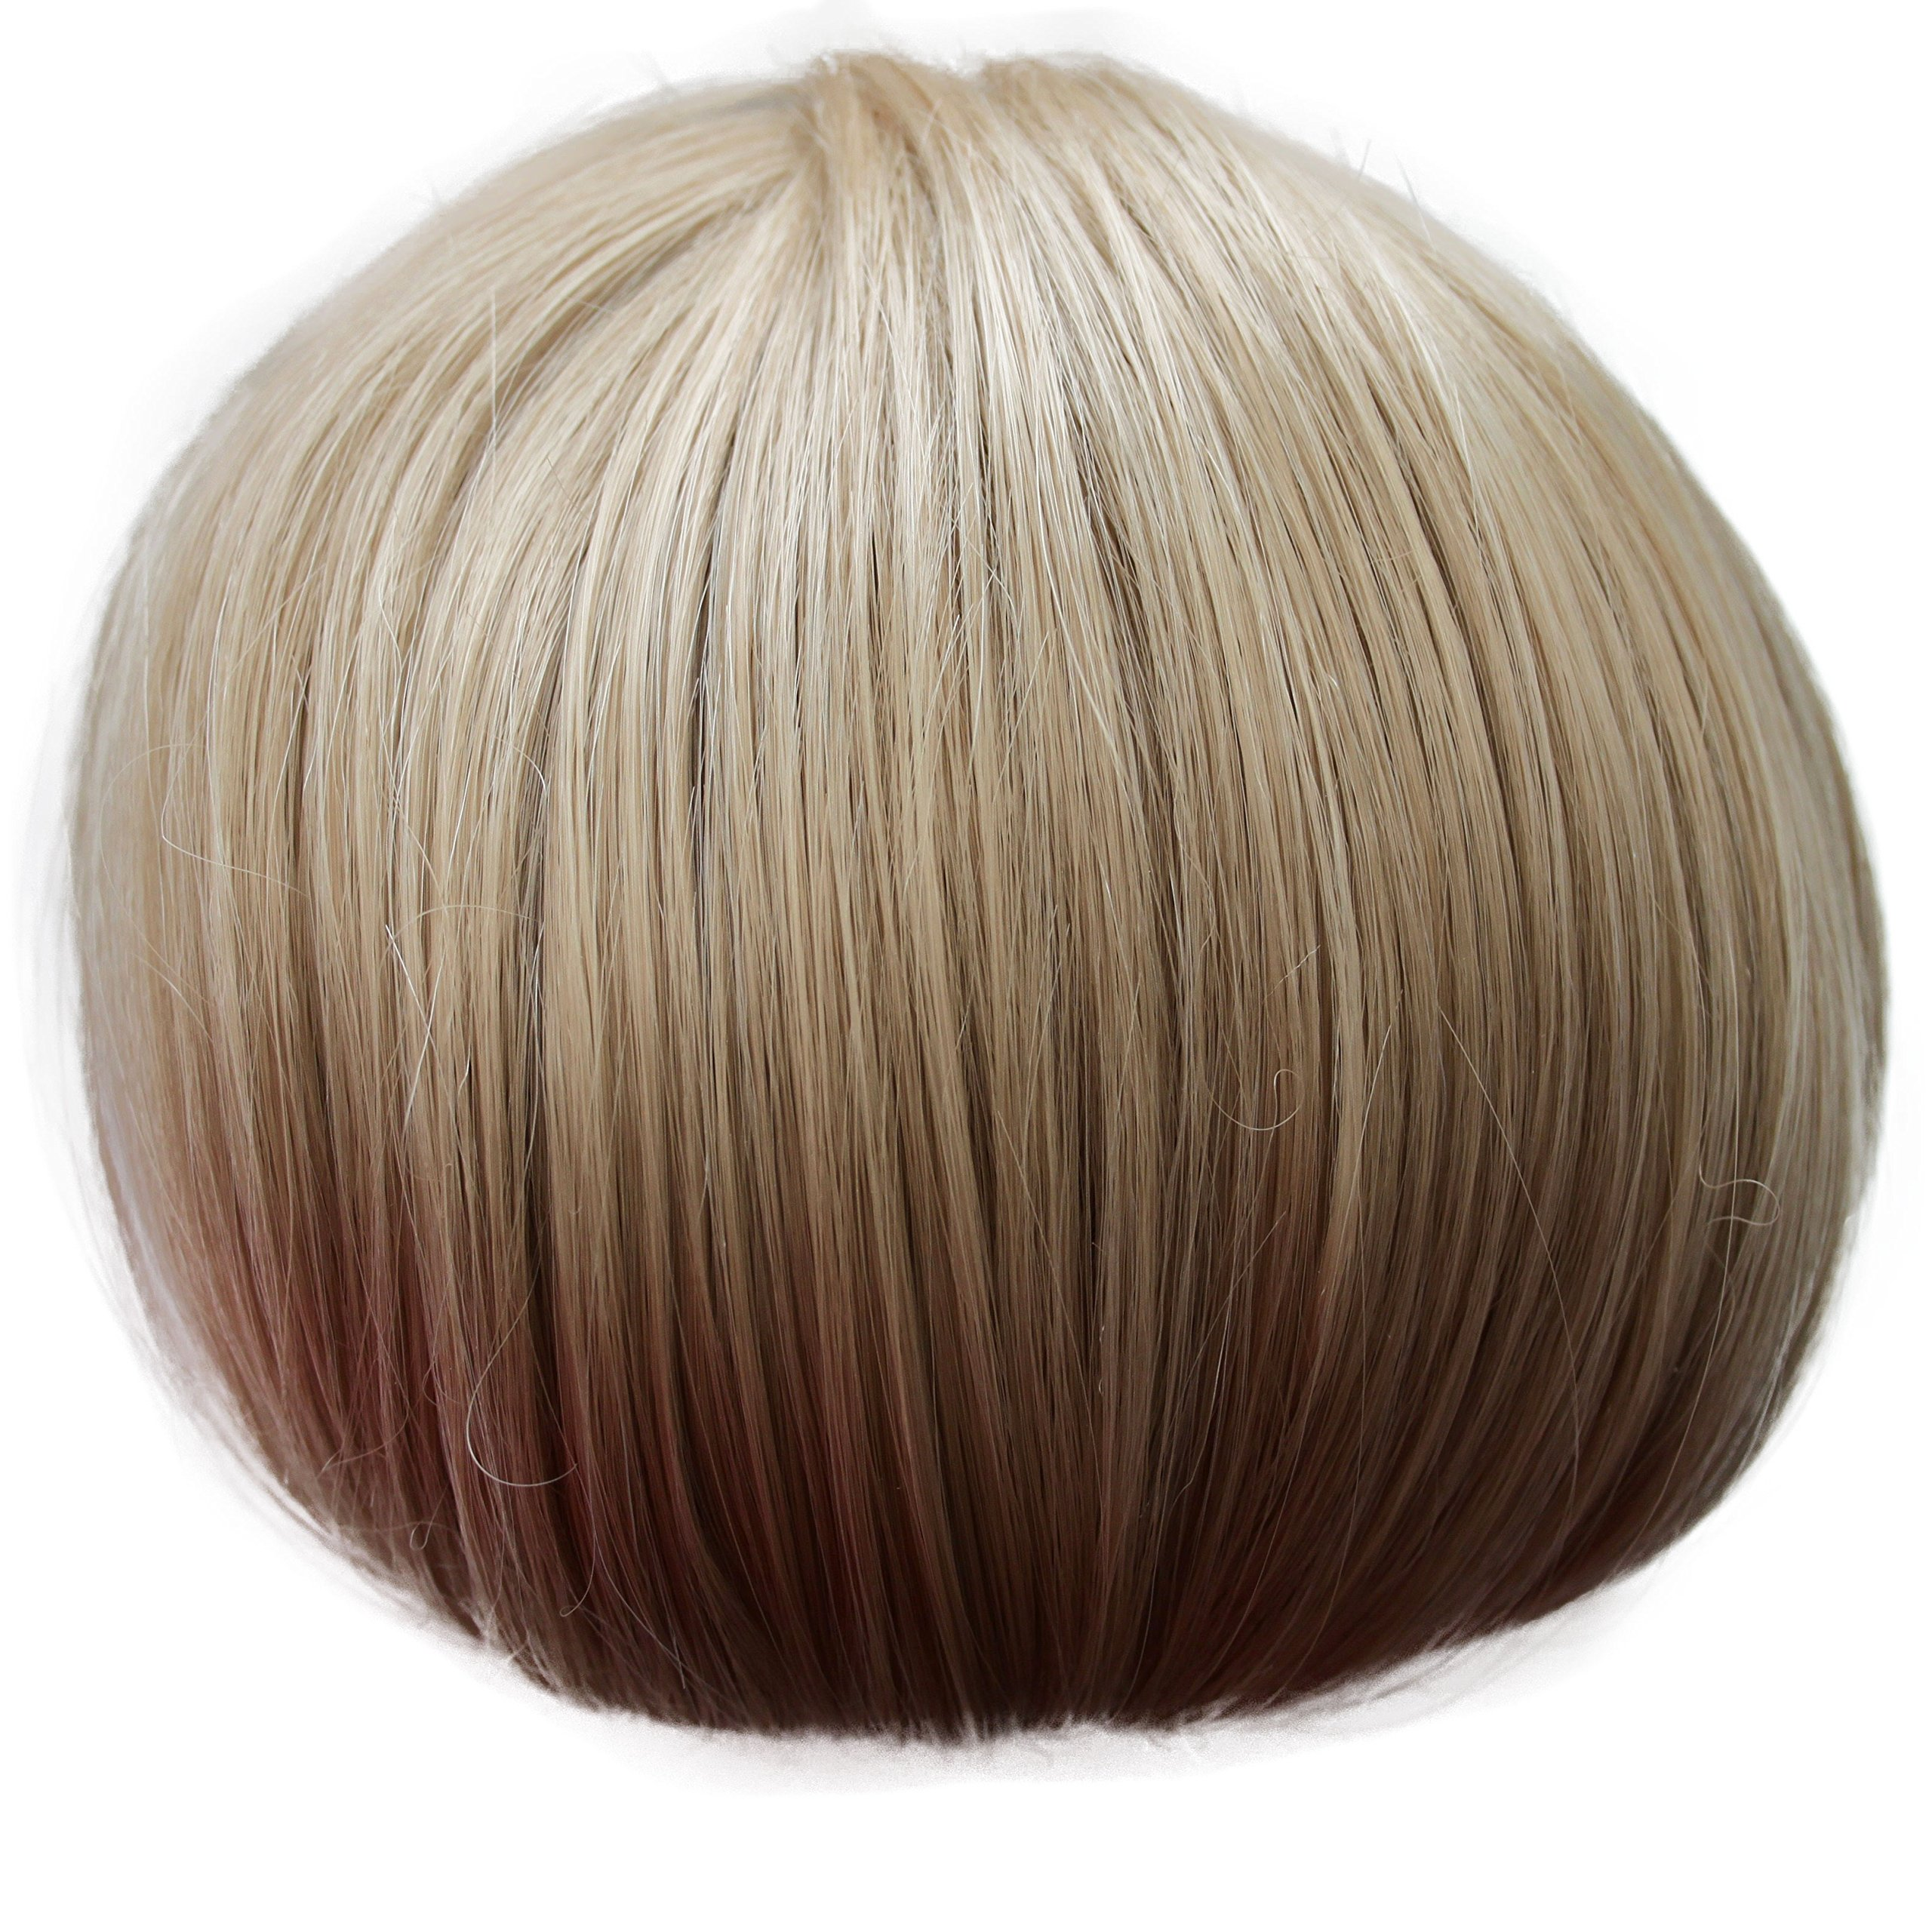 PRETTYSHOP Up Do Hair Bun Topknot Knot Scrunchy Scrunchie Hair Piece Pony Tail Draw String Elegant Lovely Div. Colours (blonde sandy 16/613)